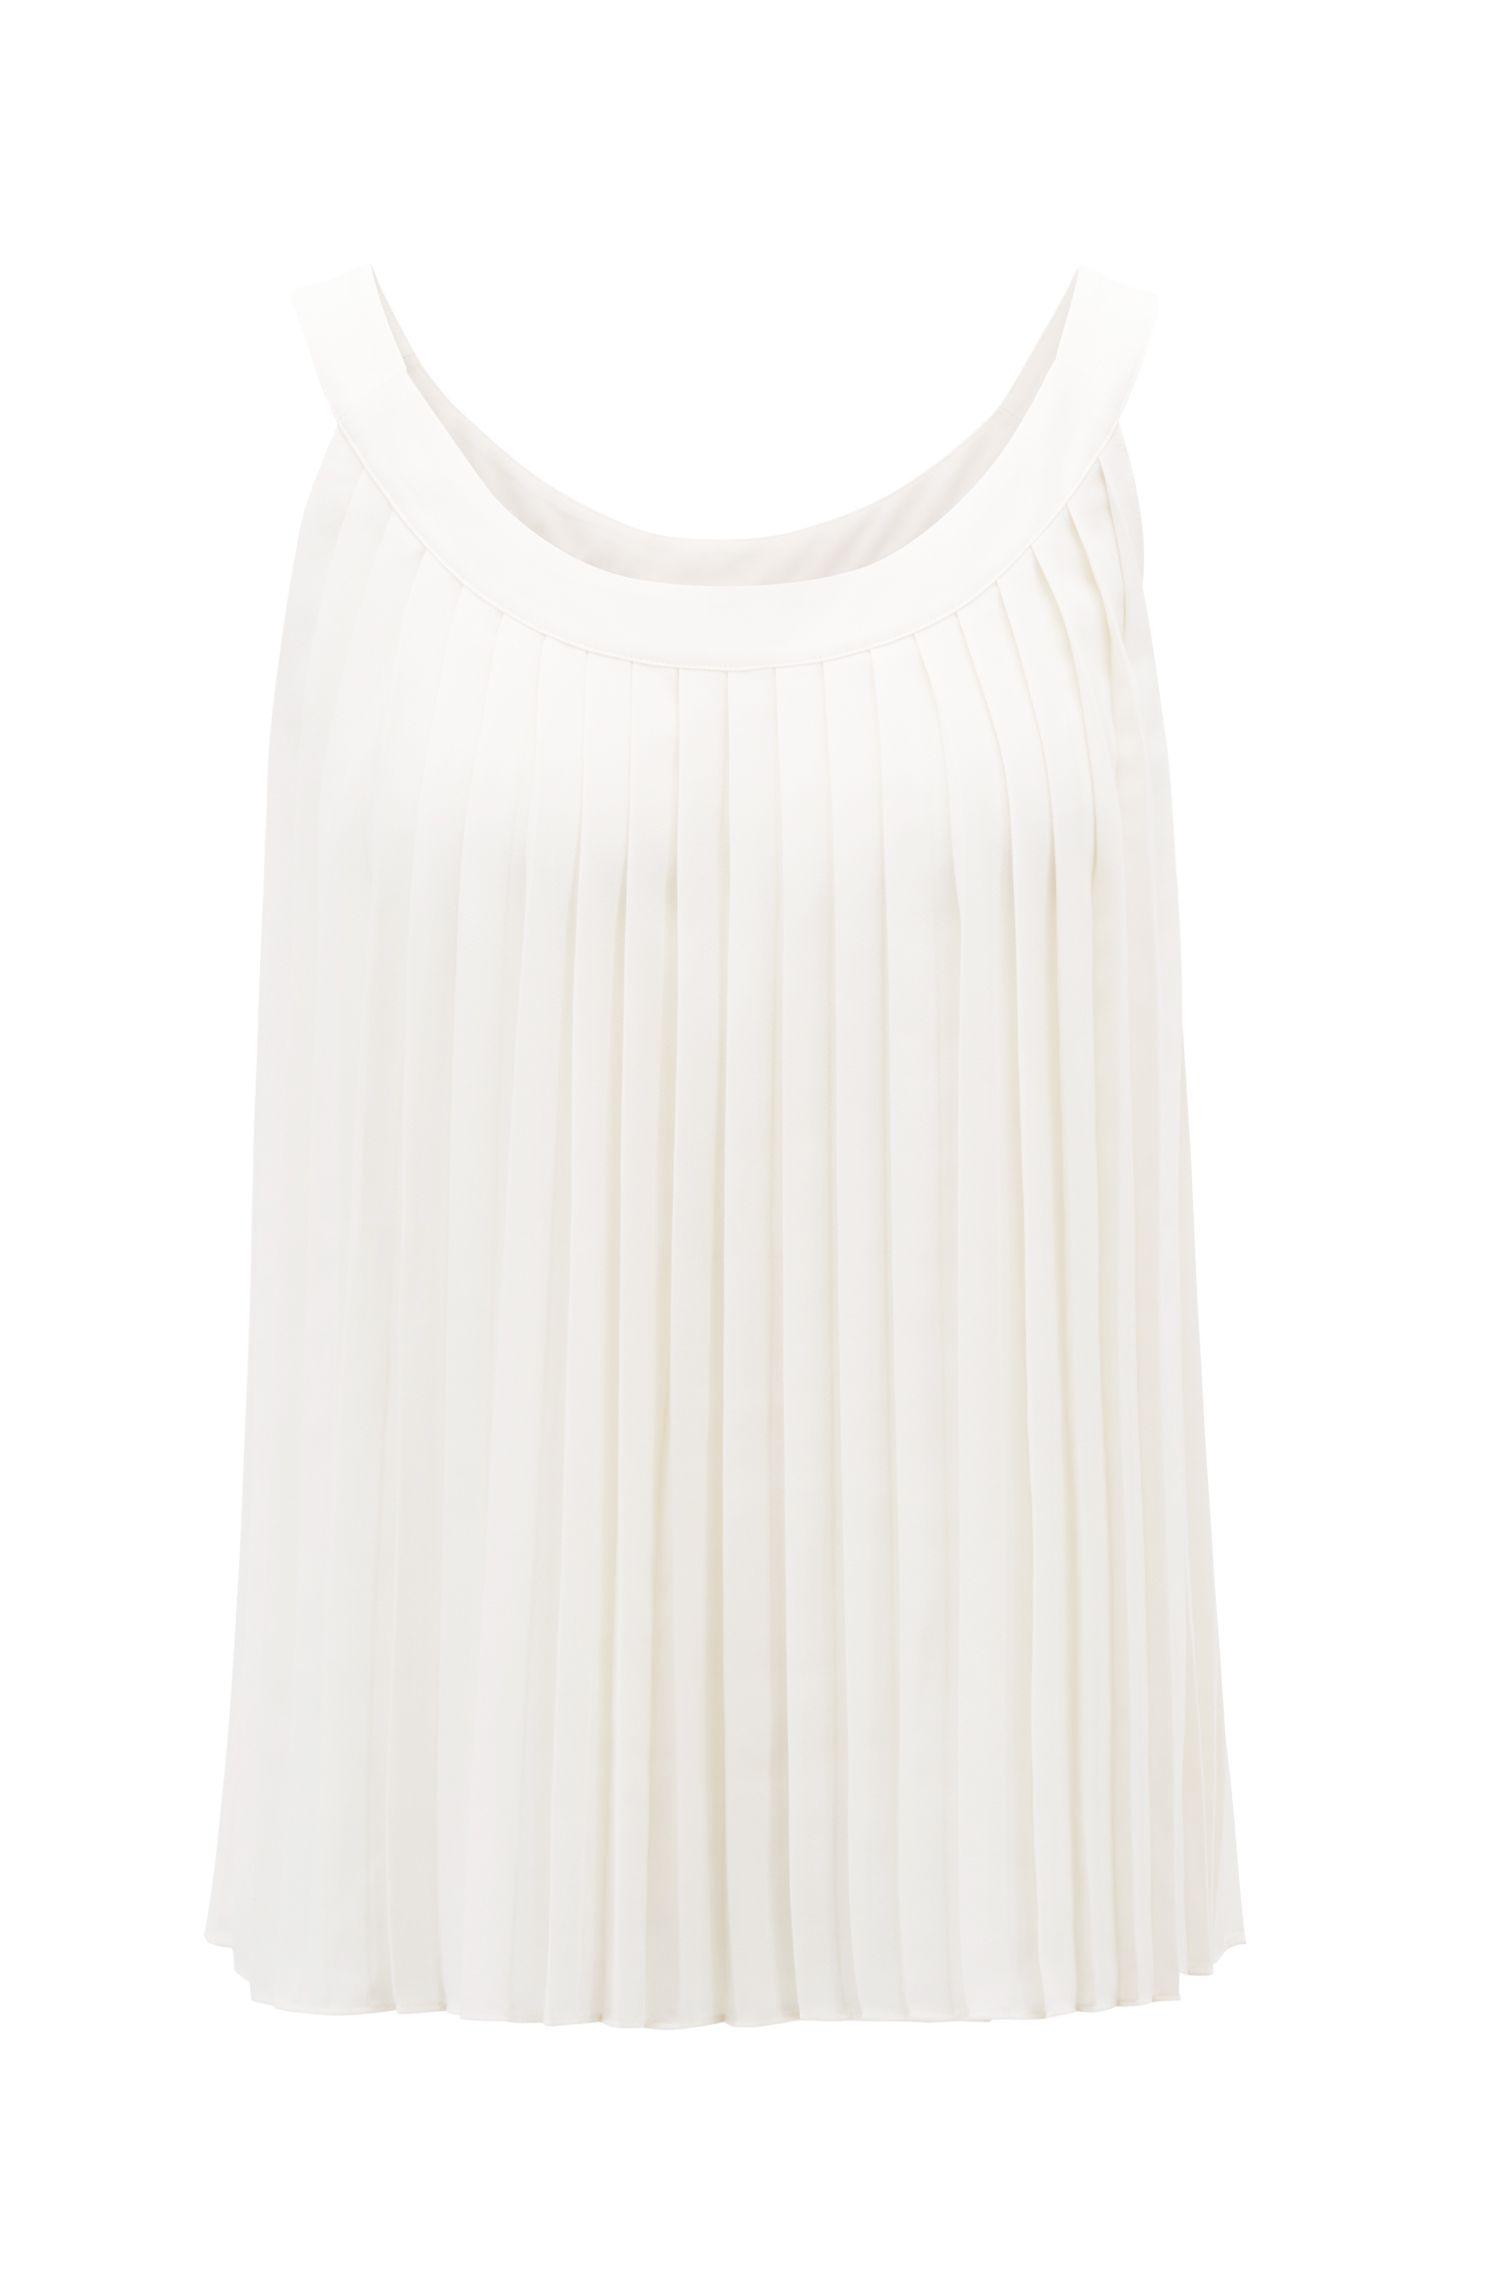 Sleeveless blouse in lightweight plissé fabric, Natural